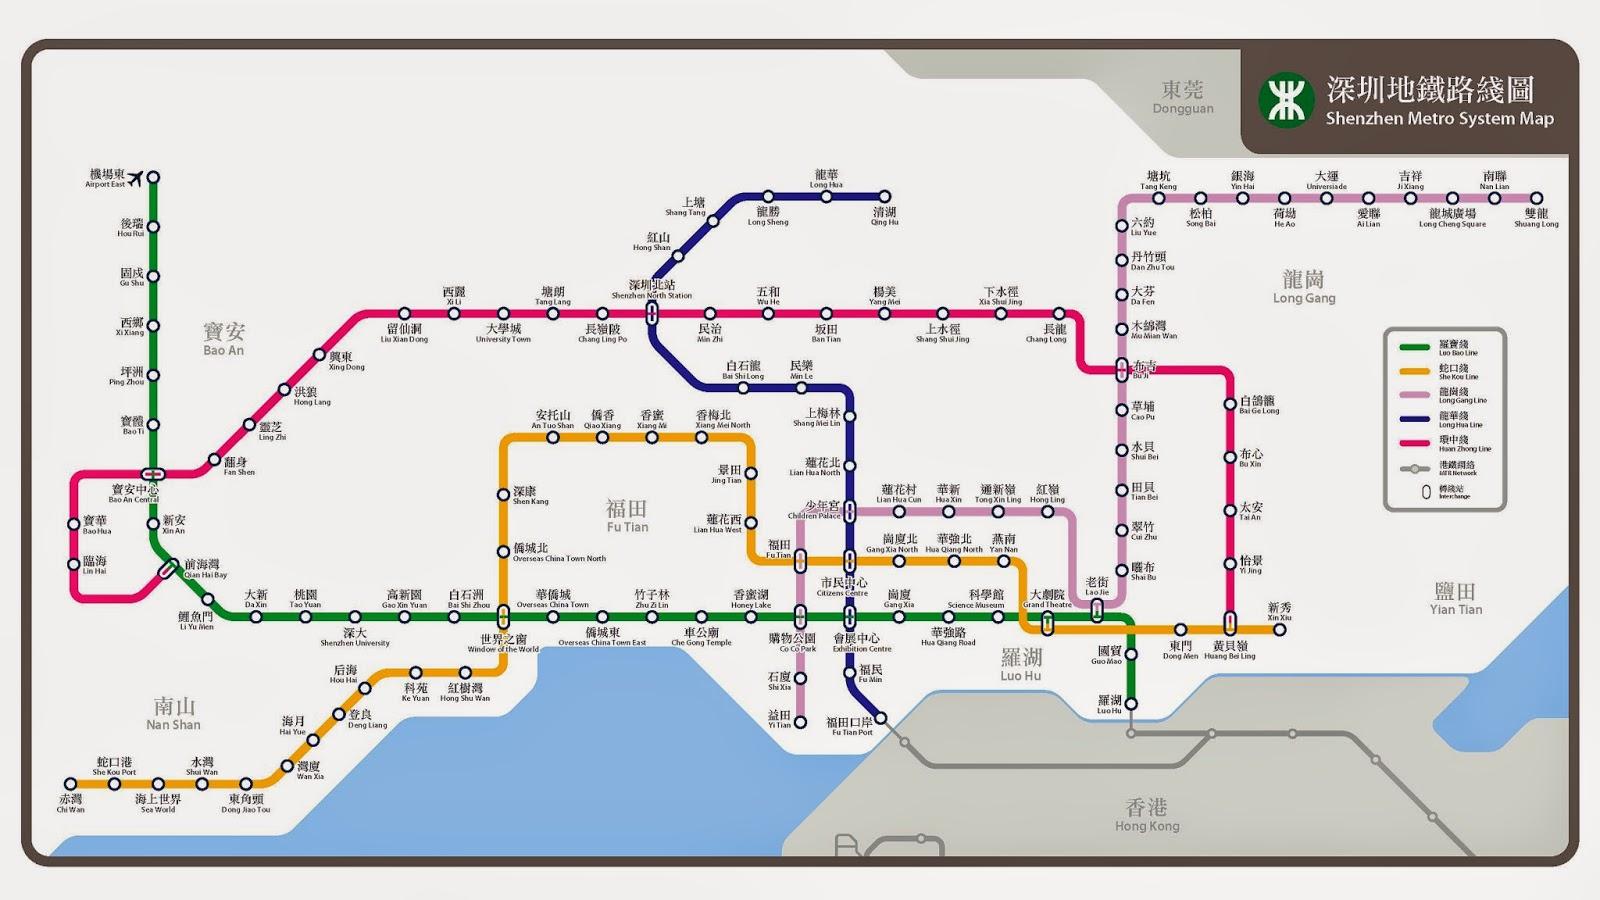 Roger Kung 的網誌: 深圳地鐵線路圖 Shenzhen Metro